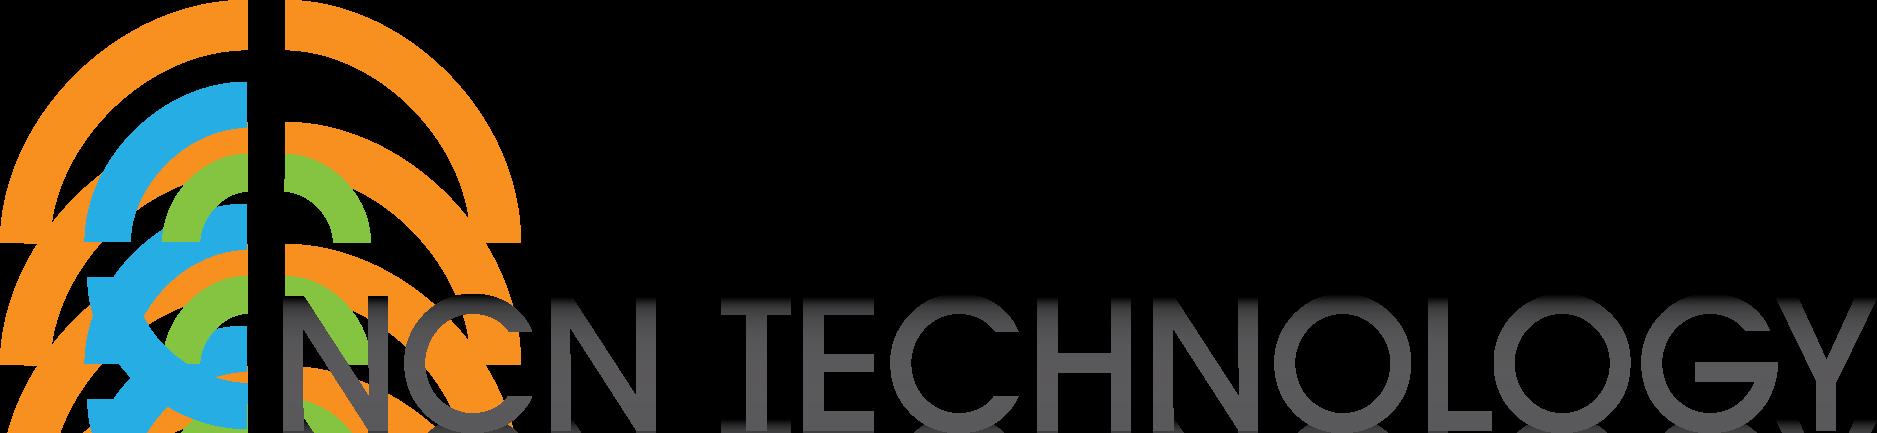 NCN Technology Logo